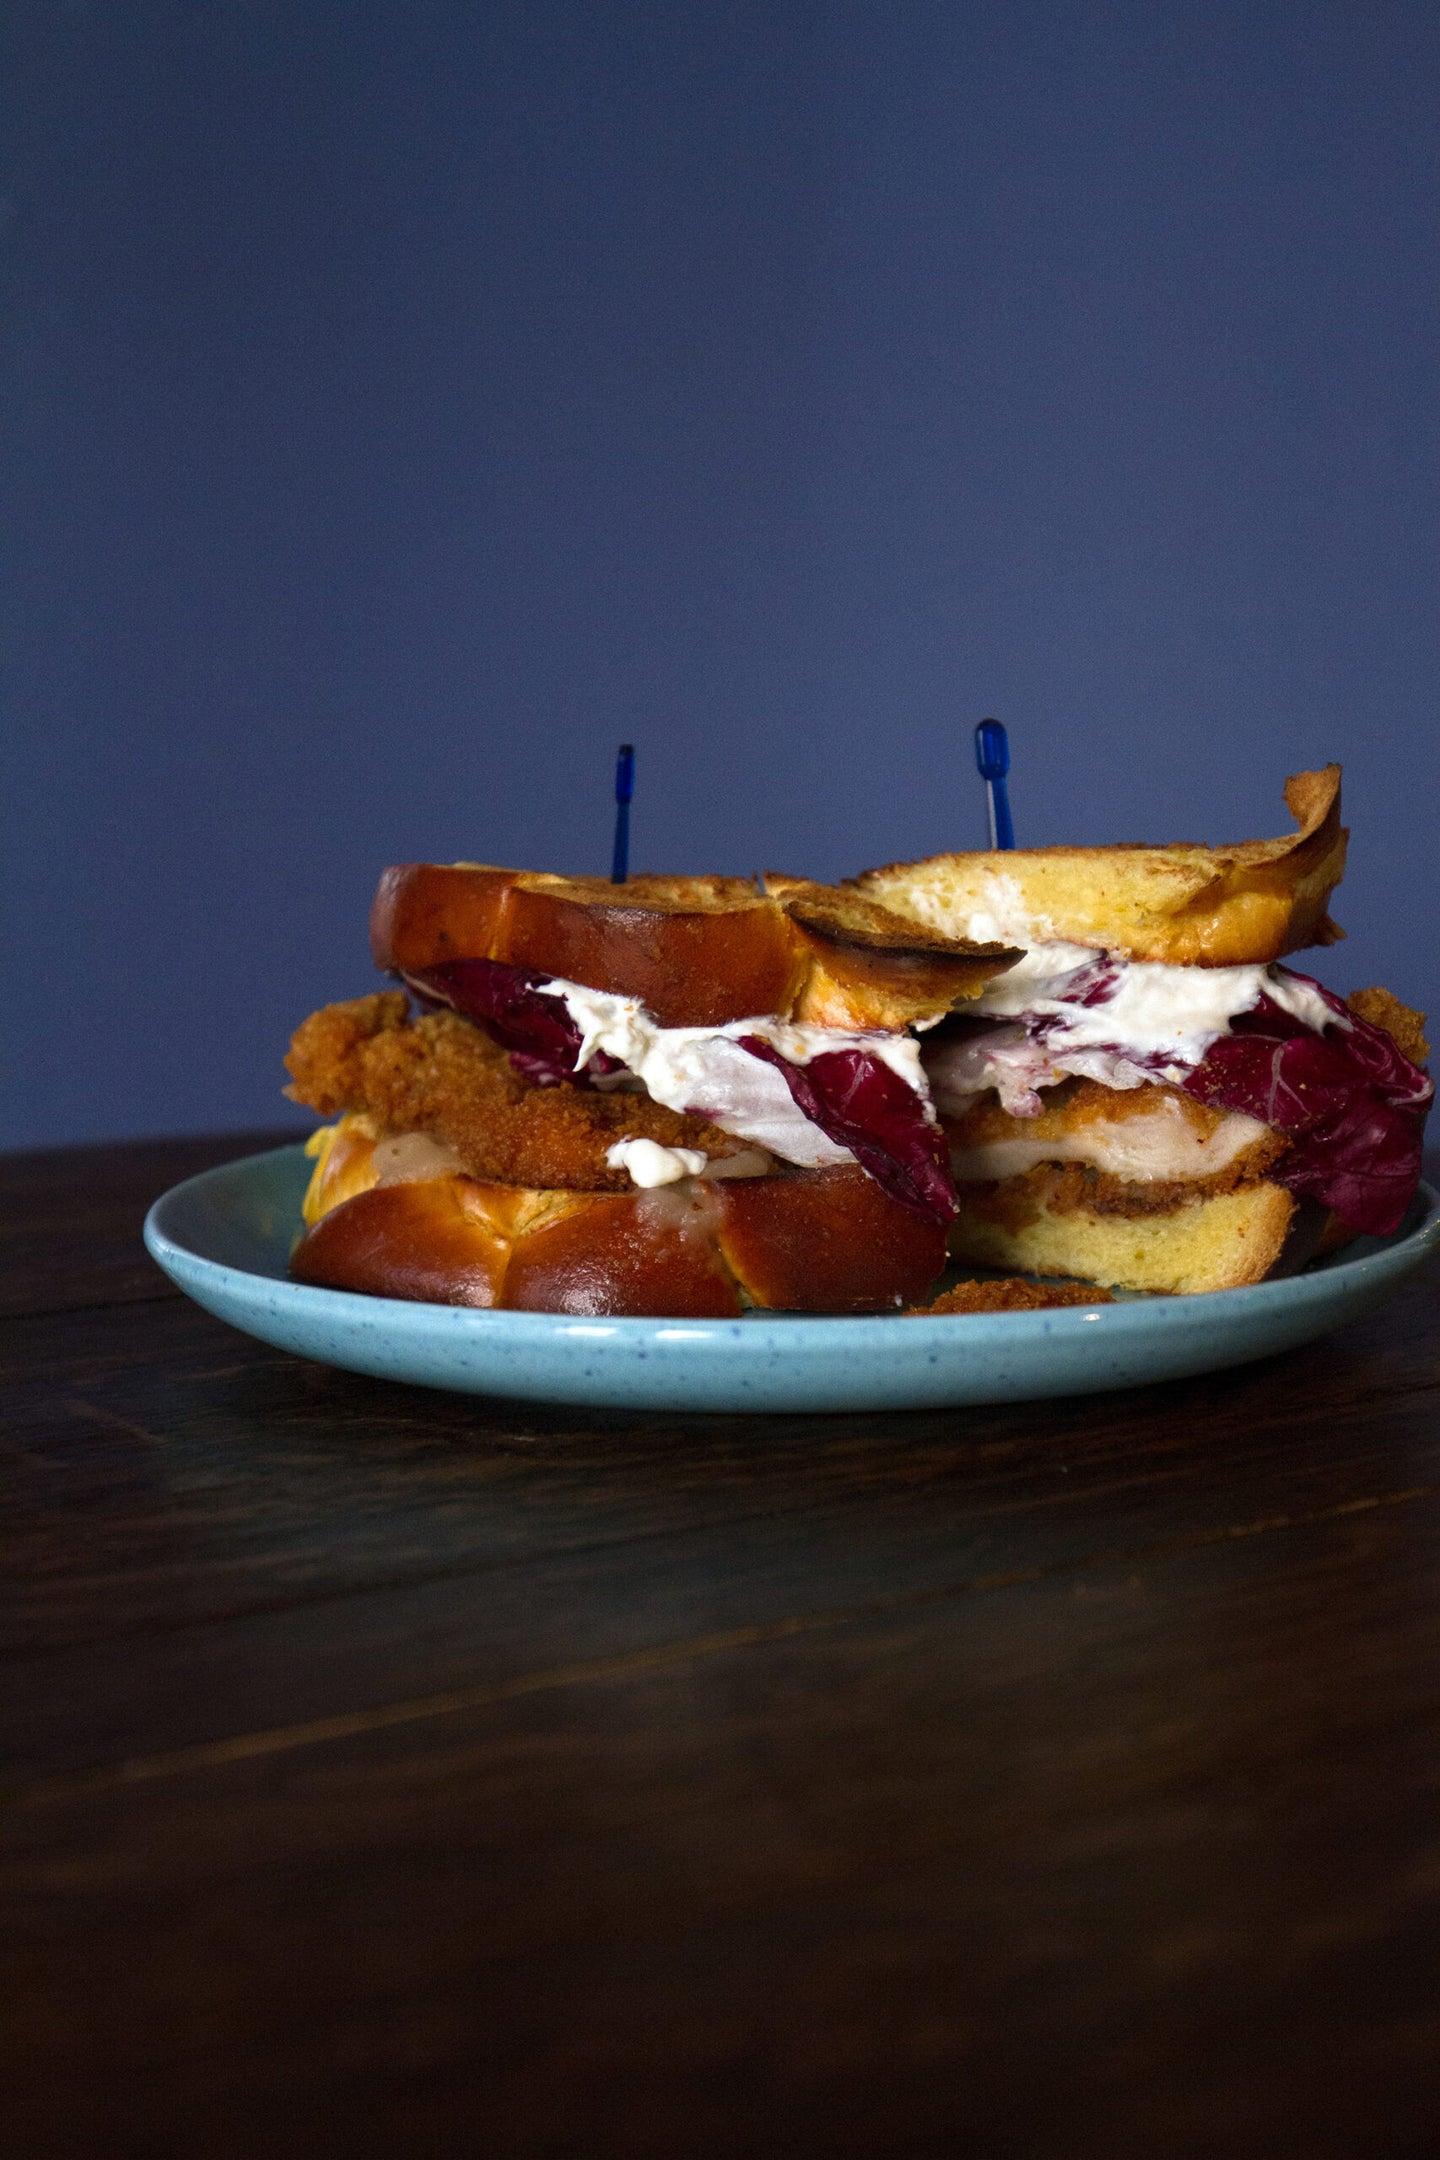 Chicken Schnitzel Sandwich with Horseradish Cream and Radicchio